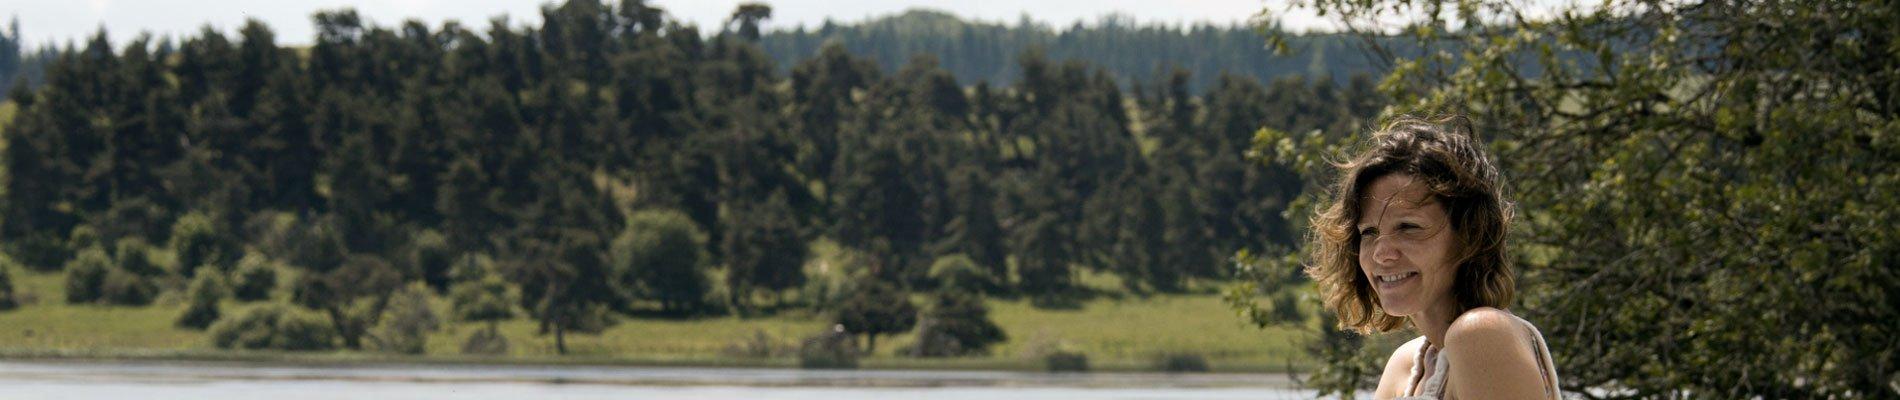 ecolodge-instants-absolus-yogaweek-auvergne